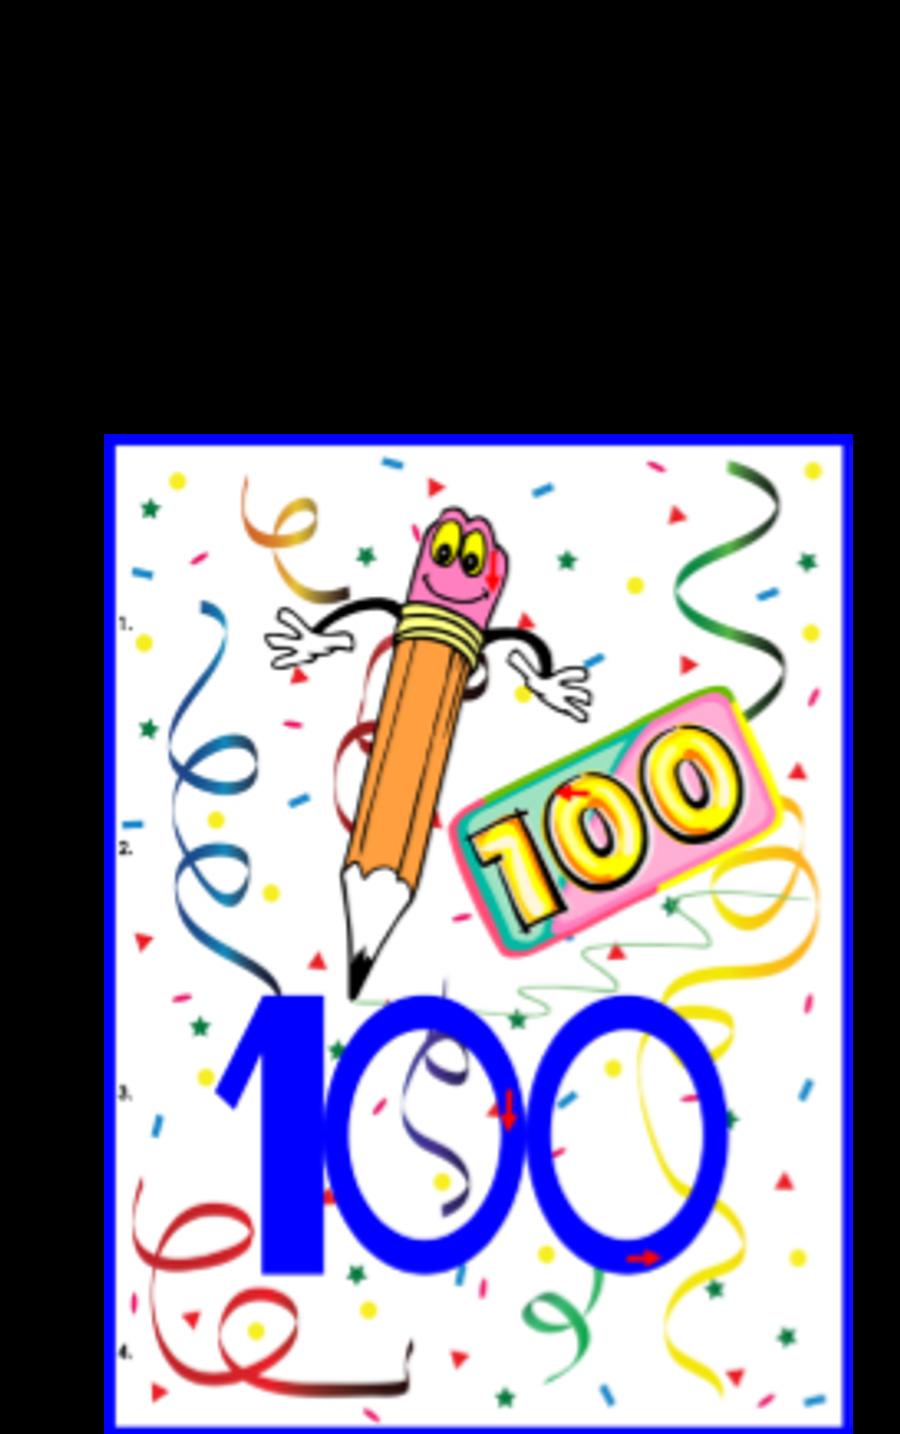 BreakoutEDU-General Studies - 100 Days of School